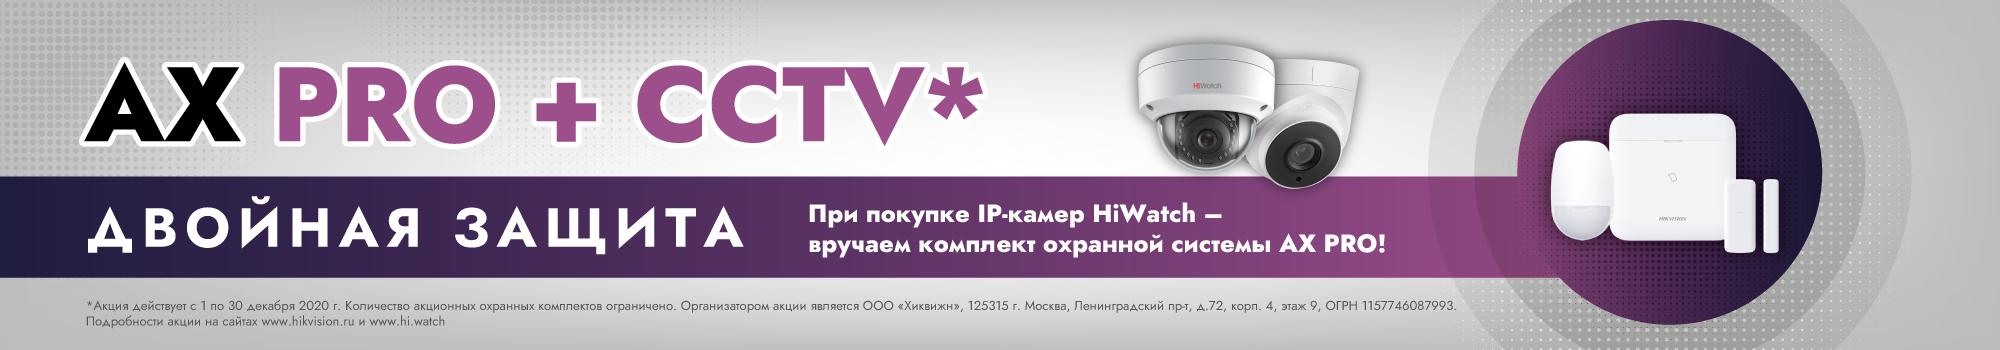 ax-pro-cctv-utv_2000x350